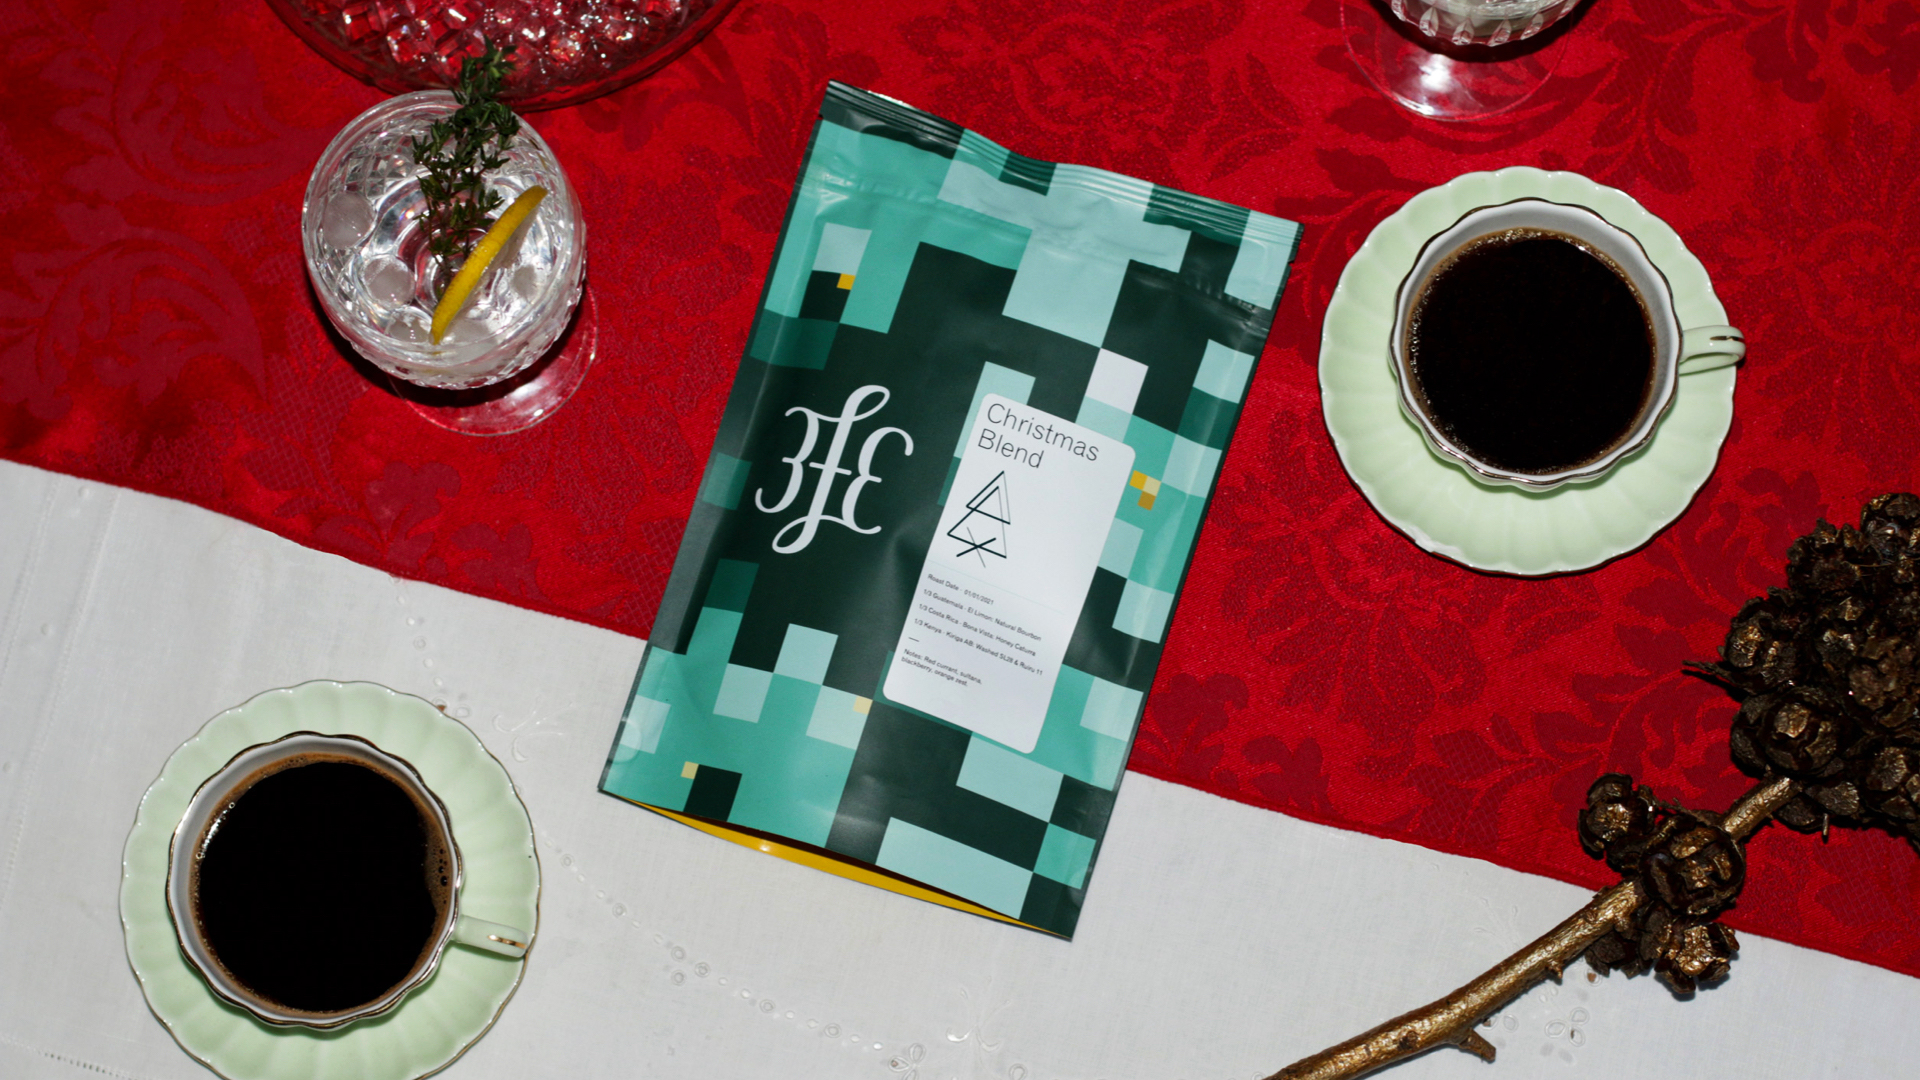 Cover image: 3fe Christmas 2020